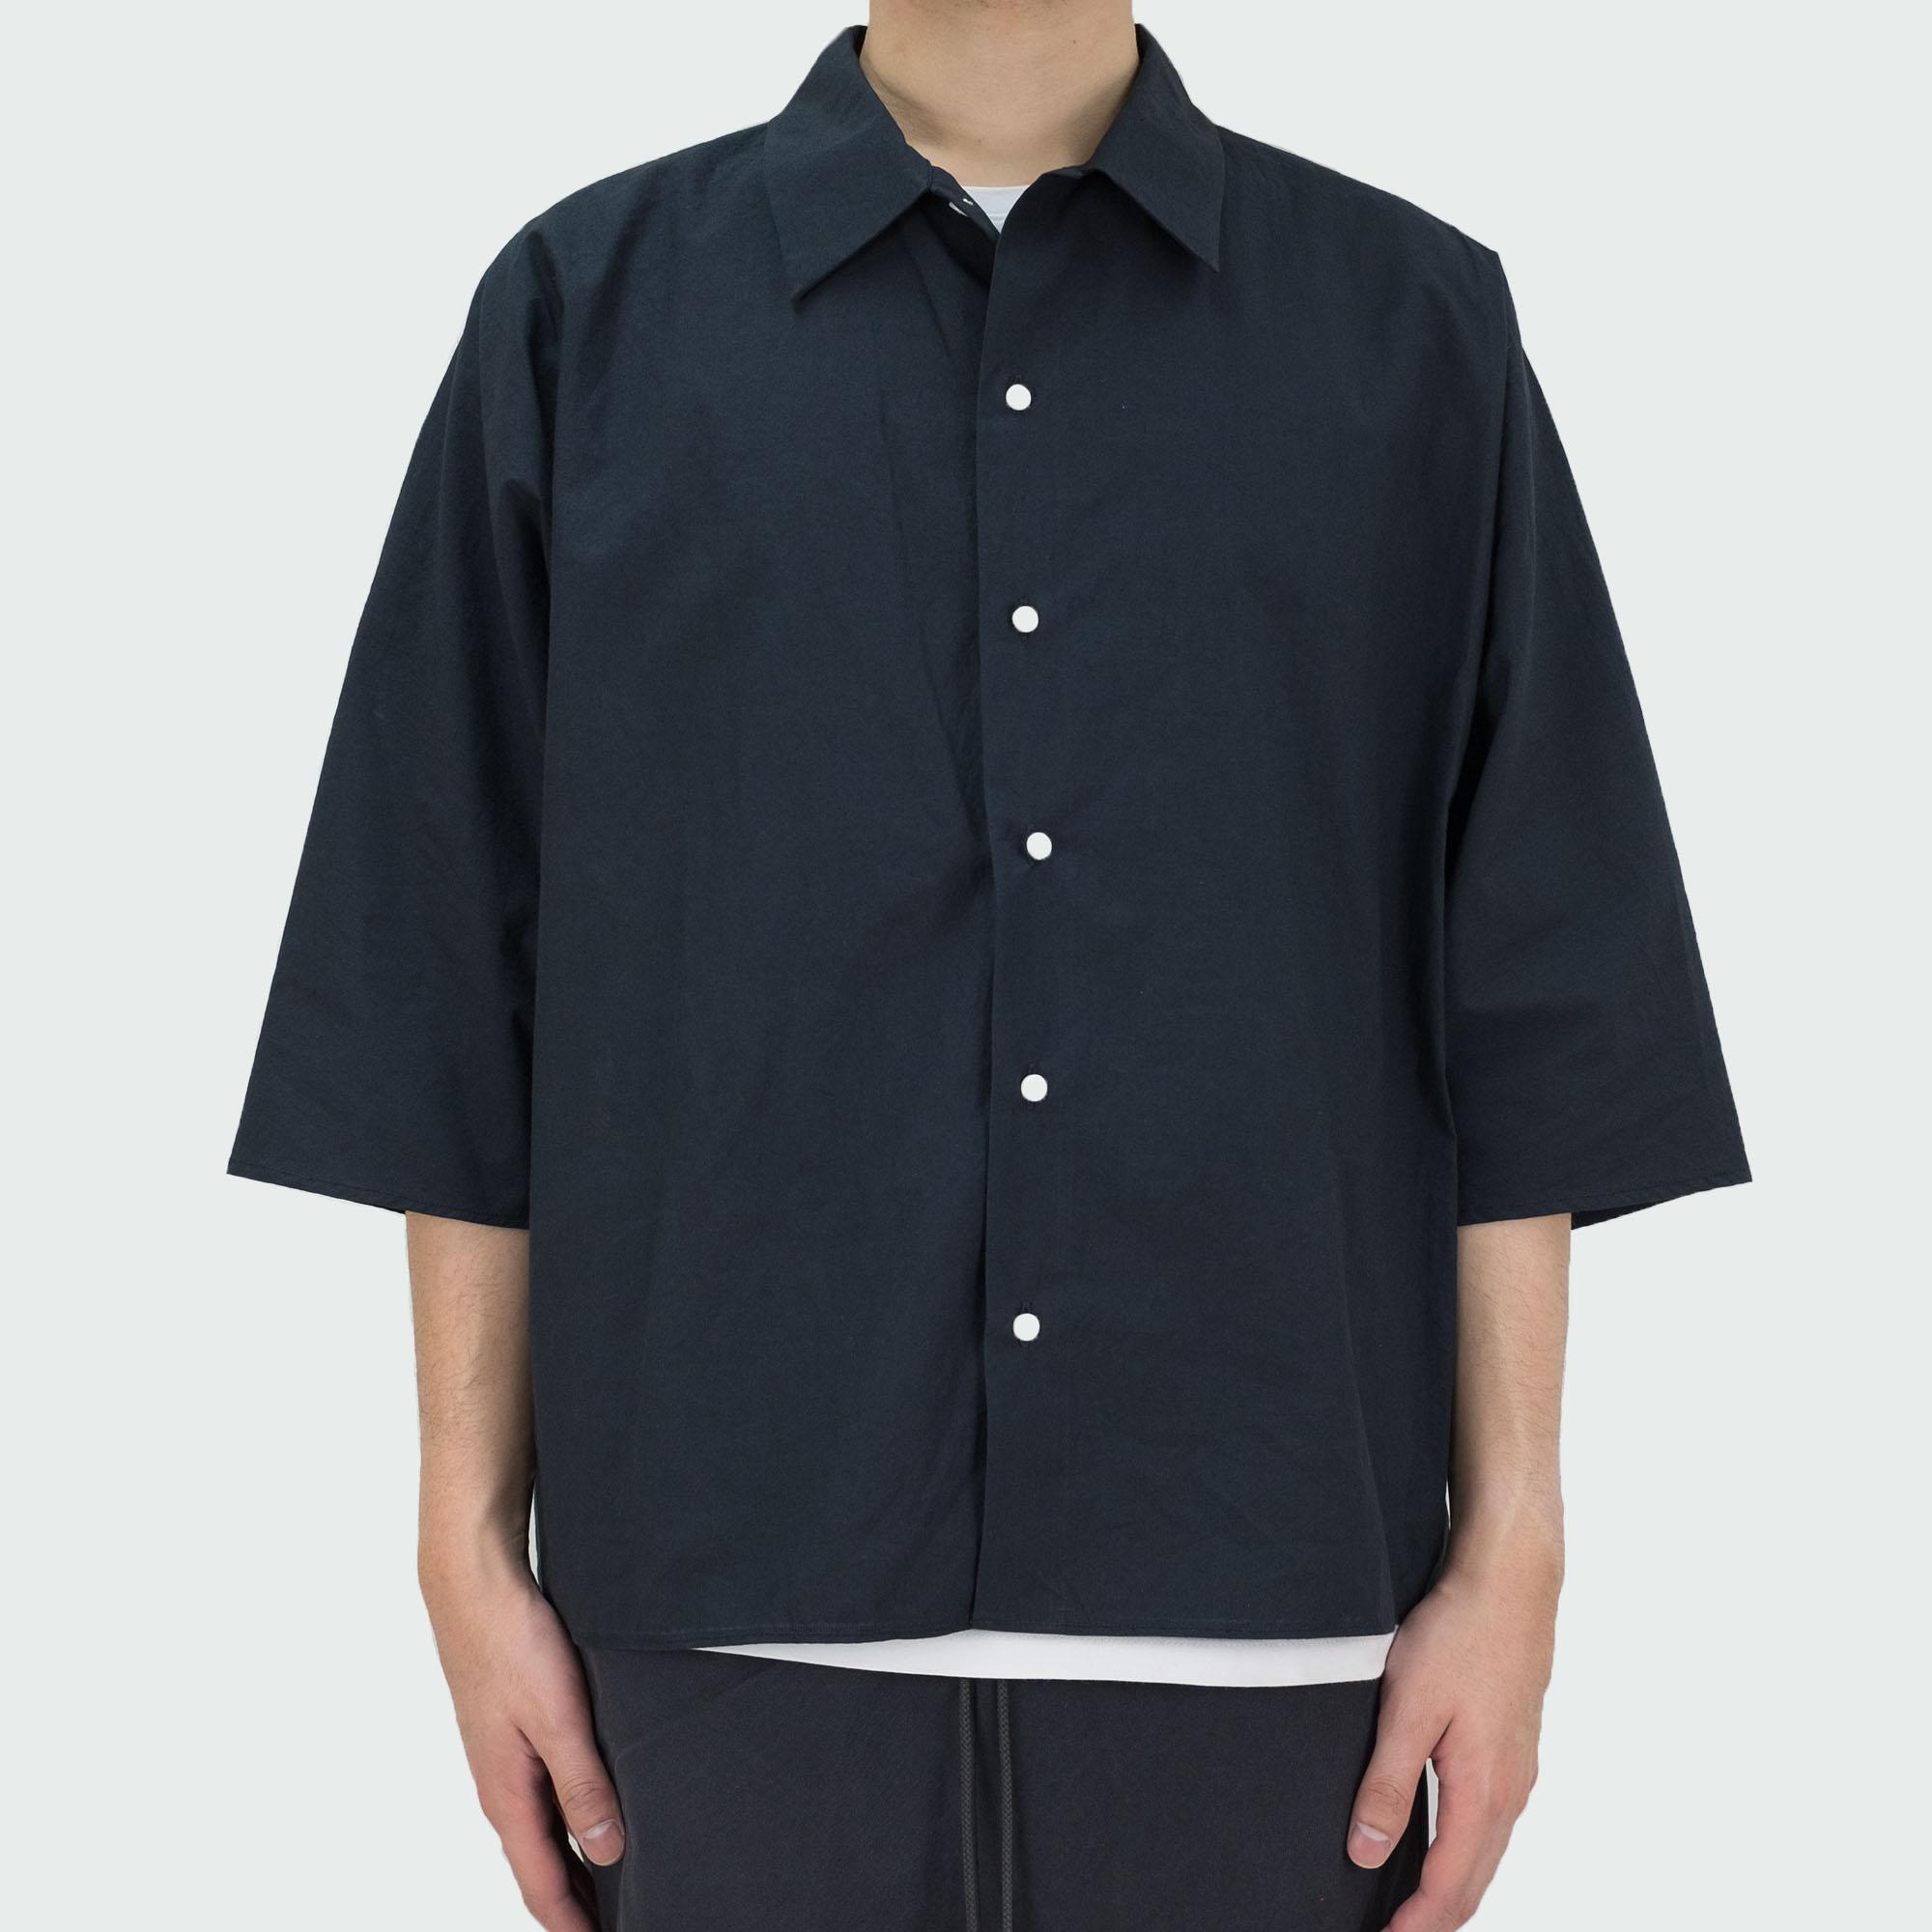 Kuro Dolman Sleeve S/S Shirt - Black